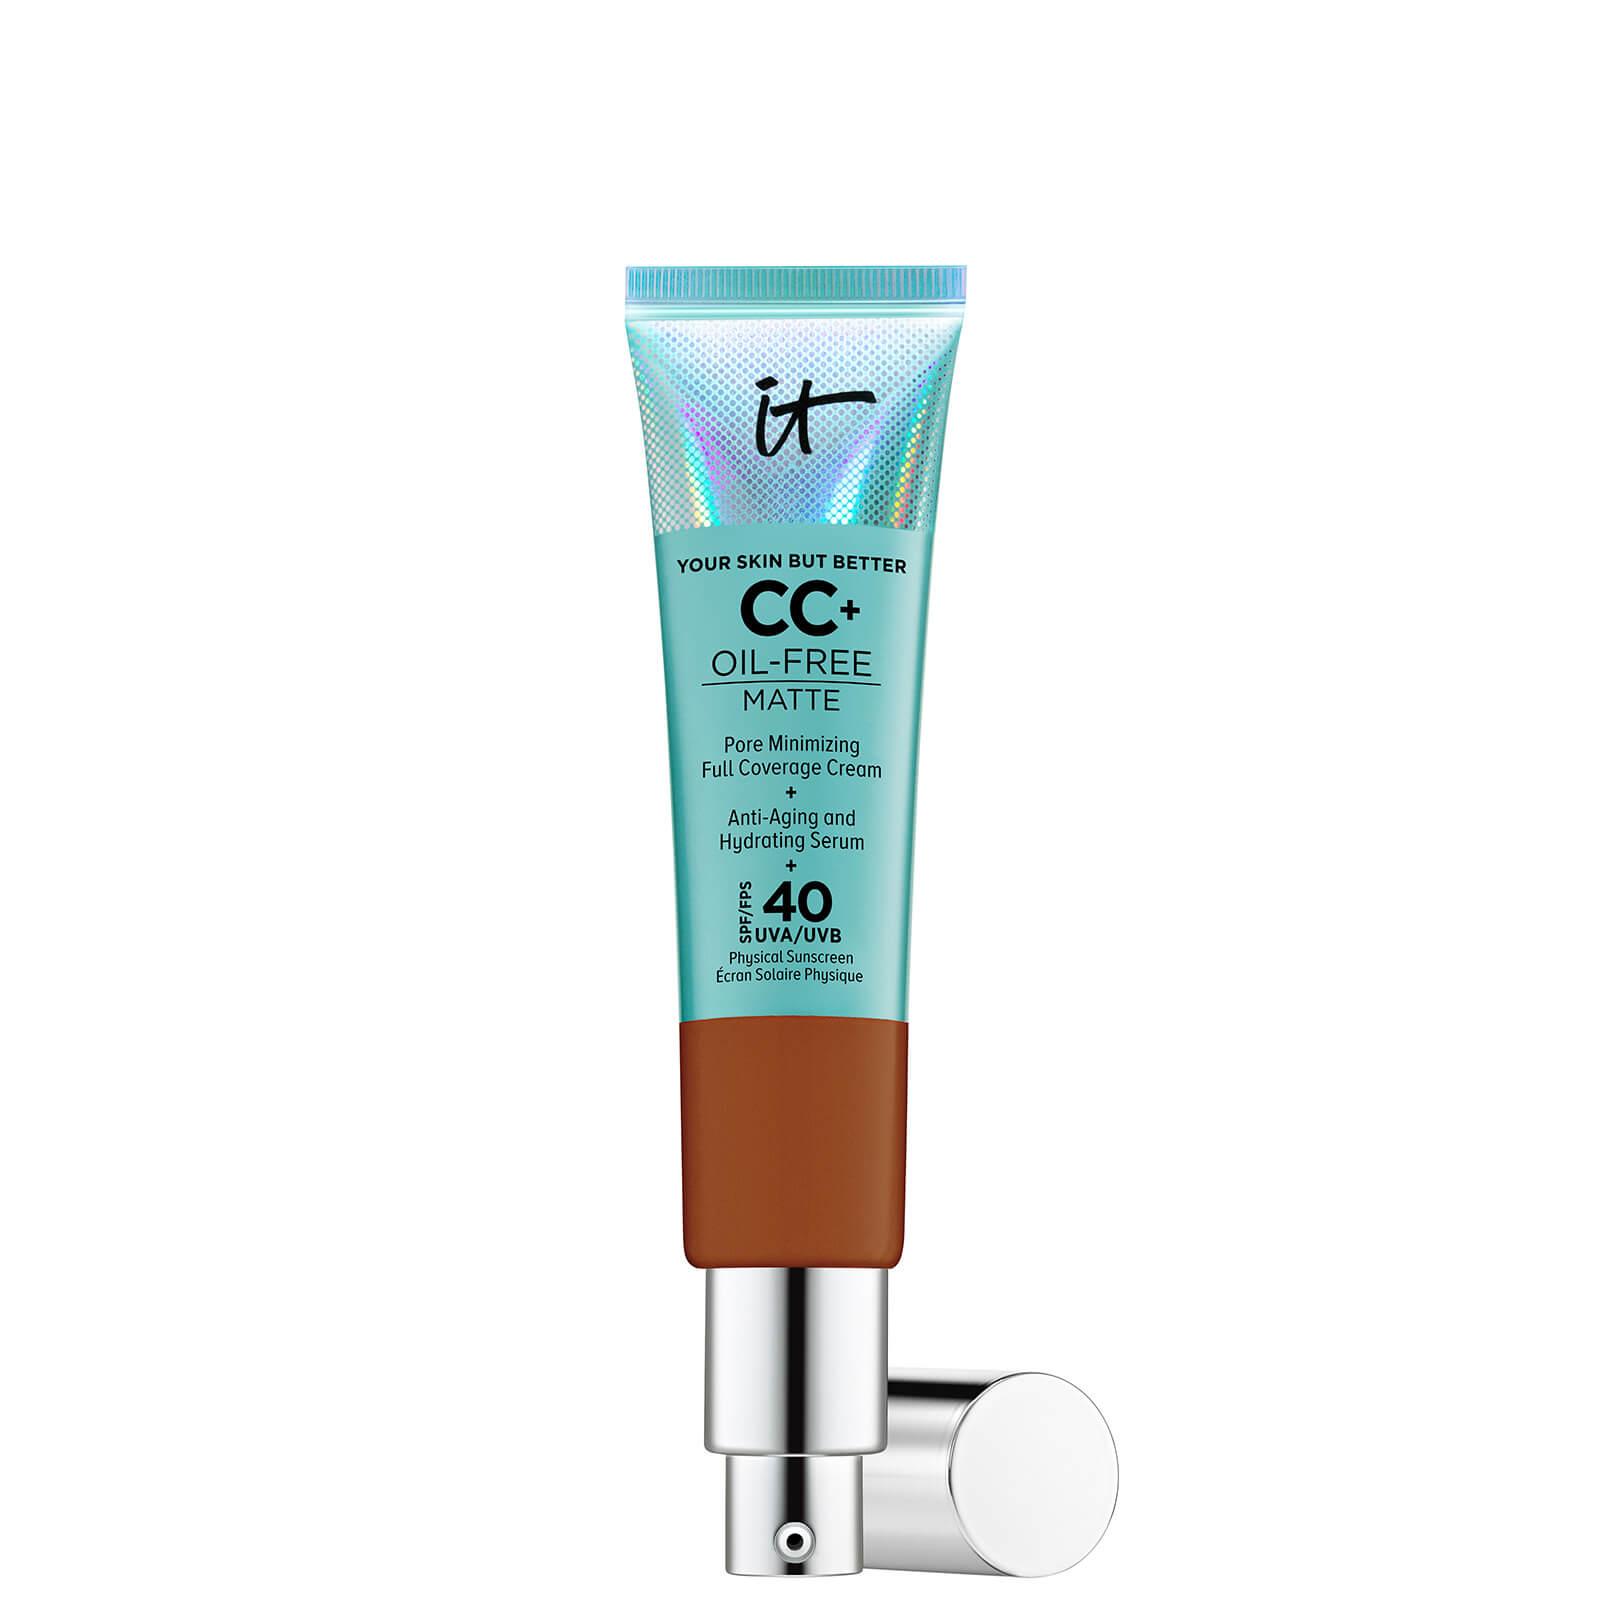 Купить IT Cosmetics Your Skin But Better CC+ Oil-Free Matte SPF40 32ml (Various Shades) - Rich Honey